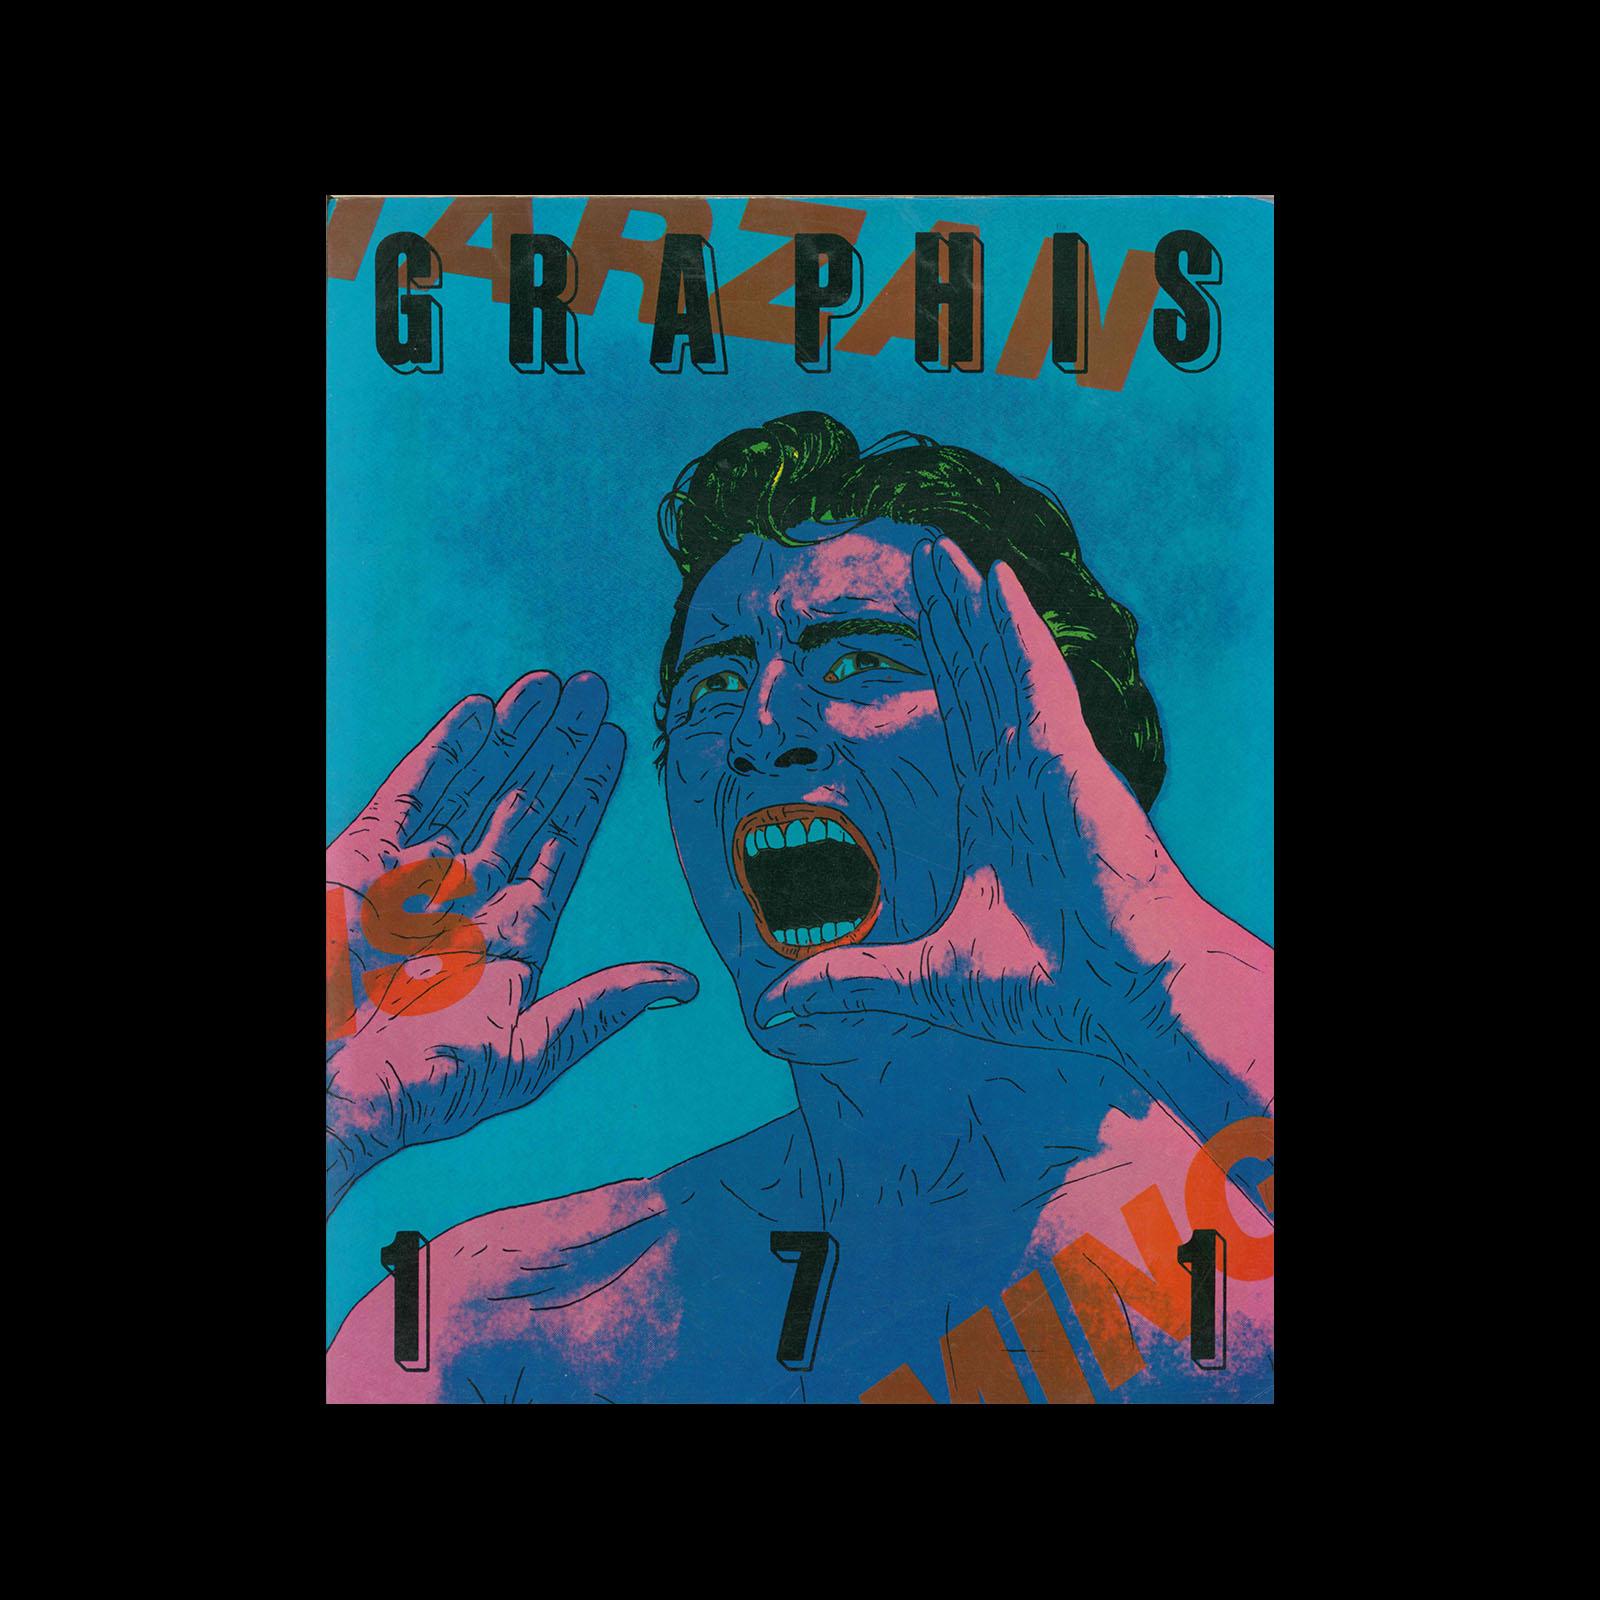 Graphis 171, 1974. Cover design by Tandanori Yokoo.